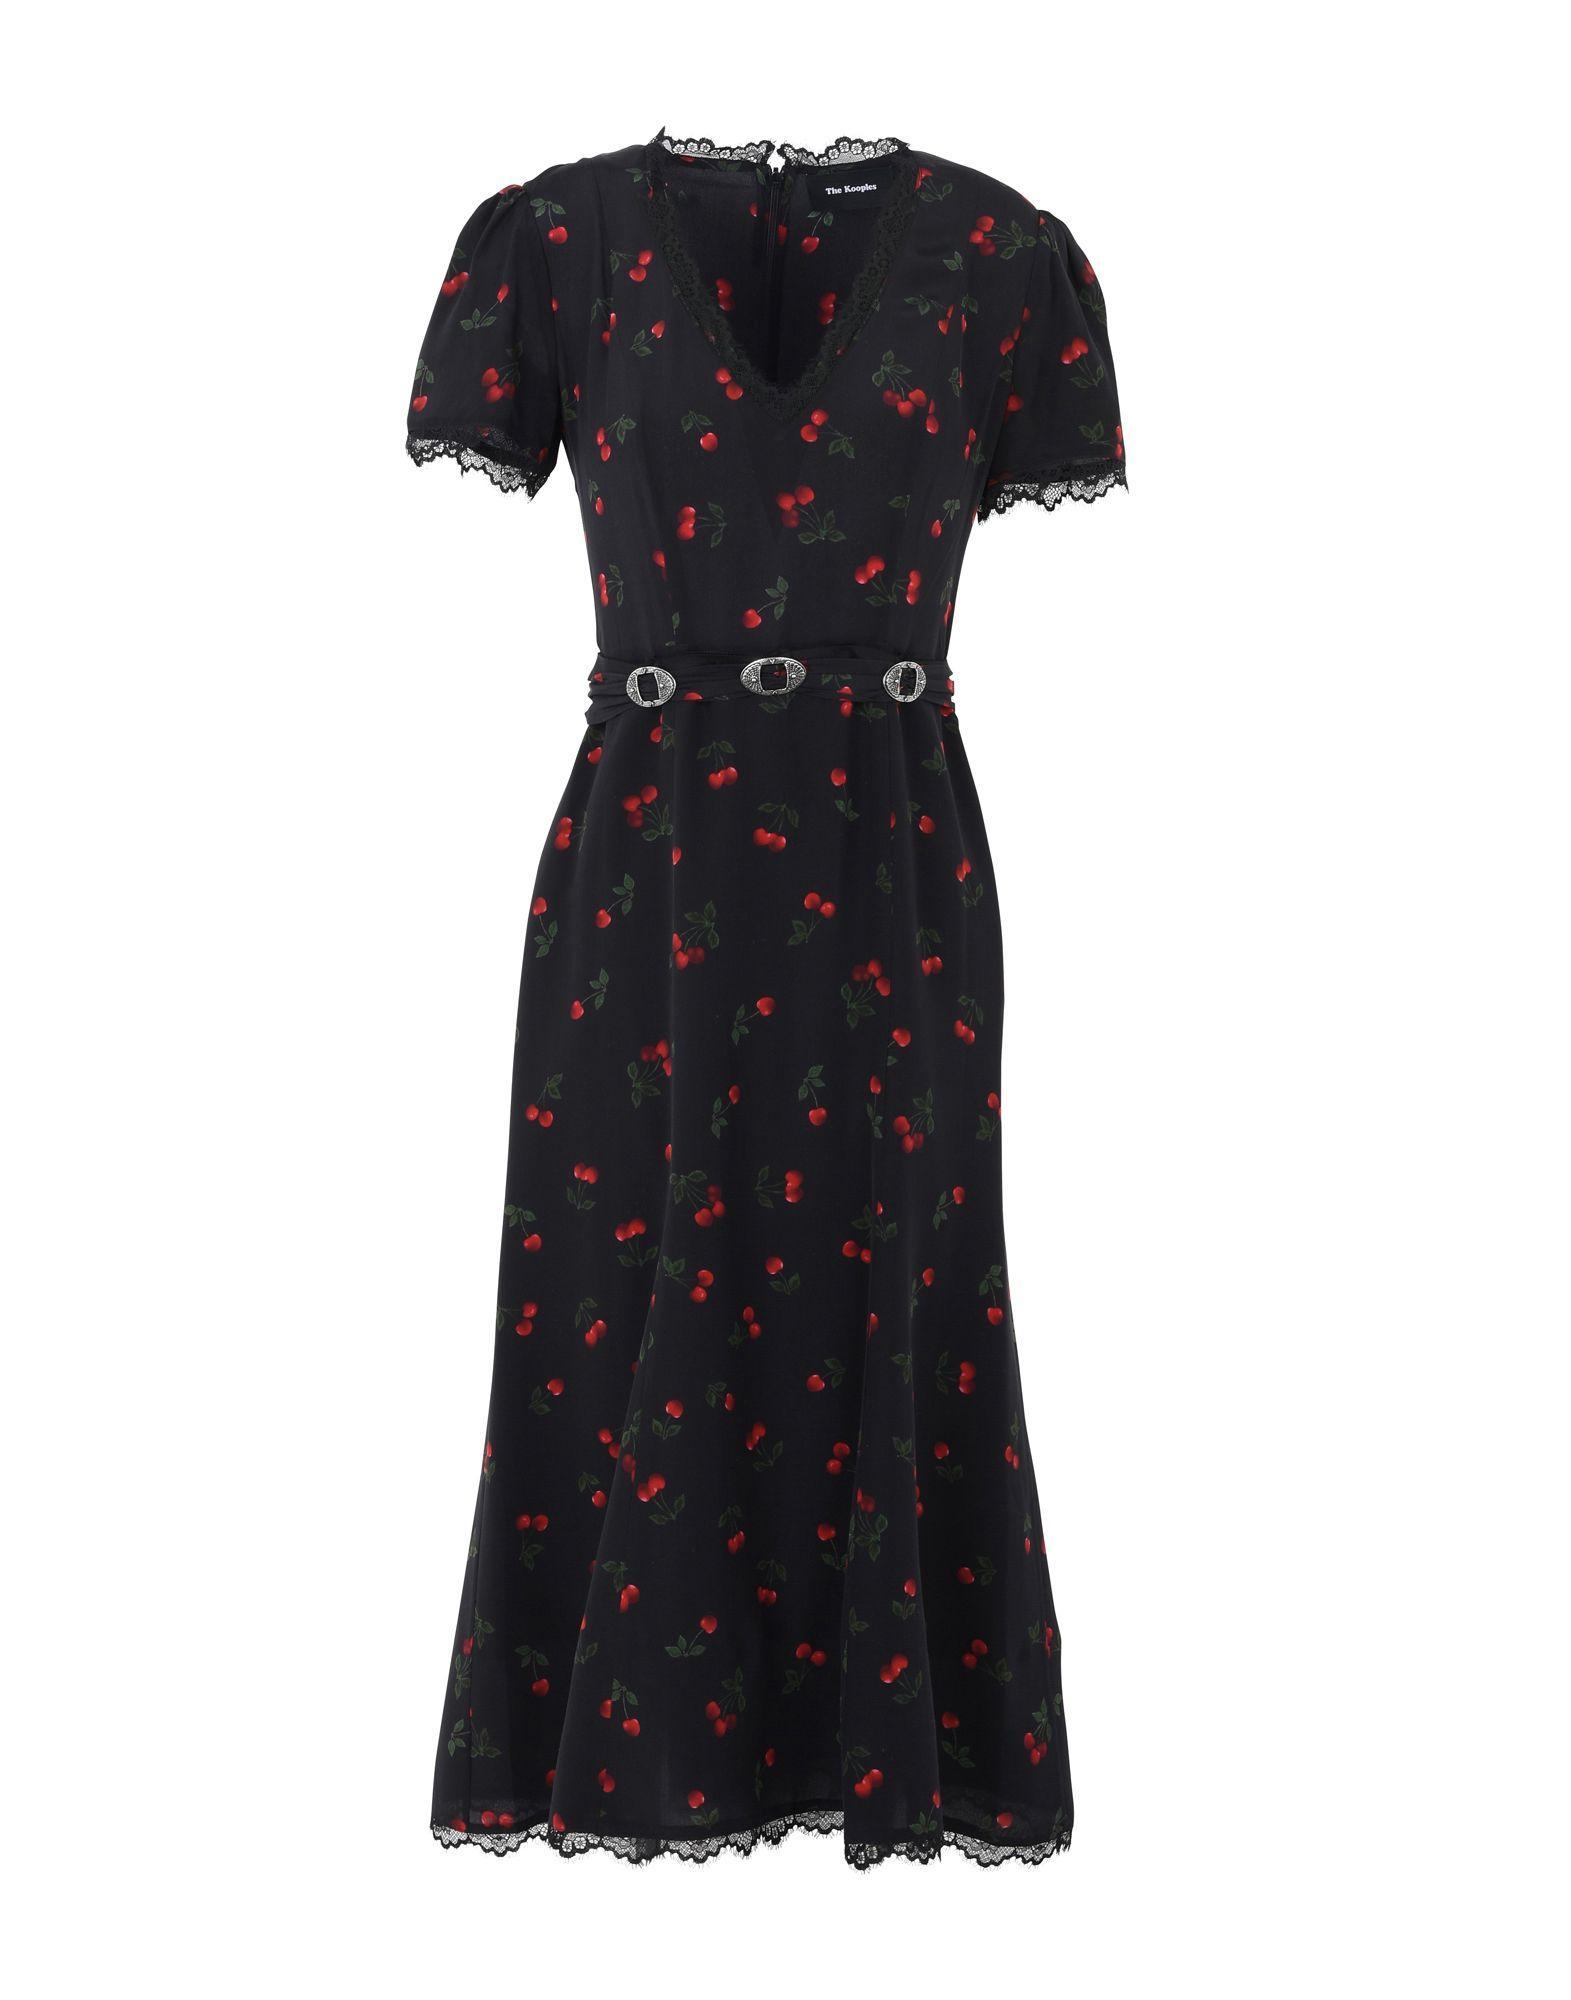 The Kooples 3/4 Length Dress In Black